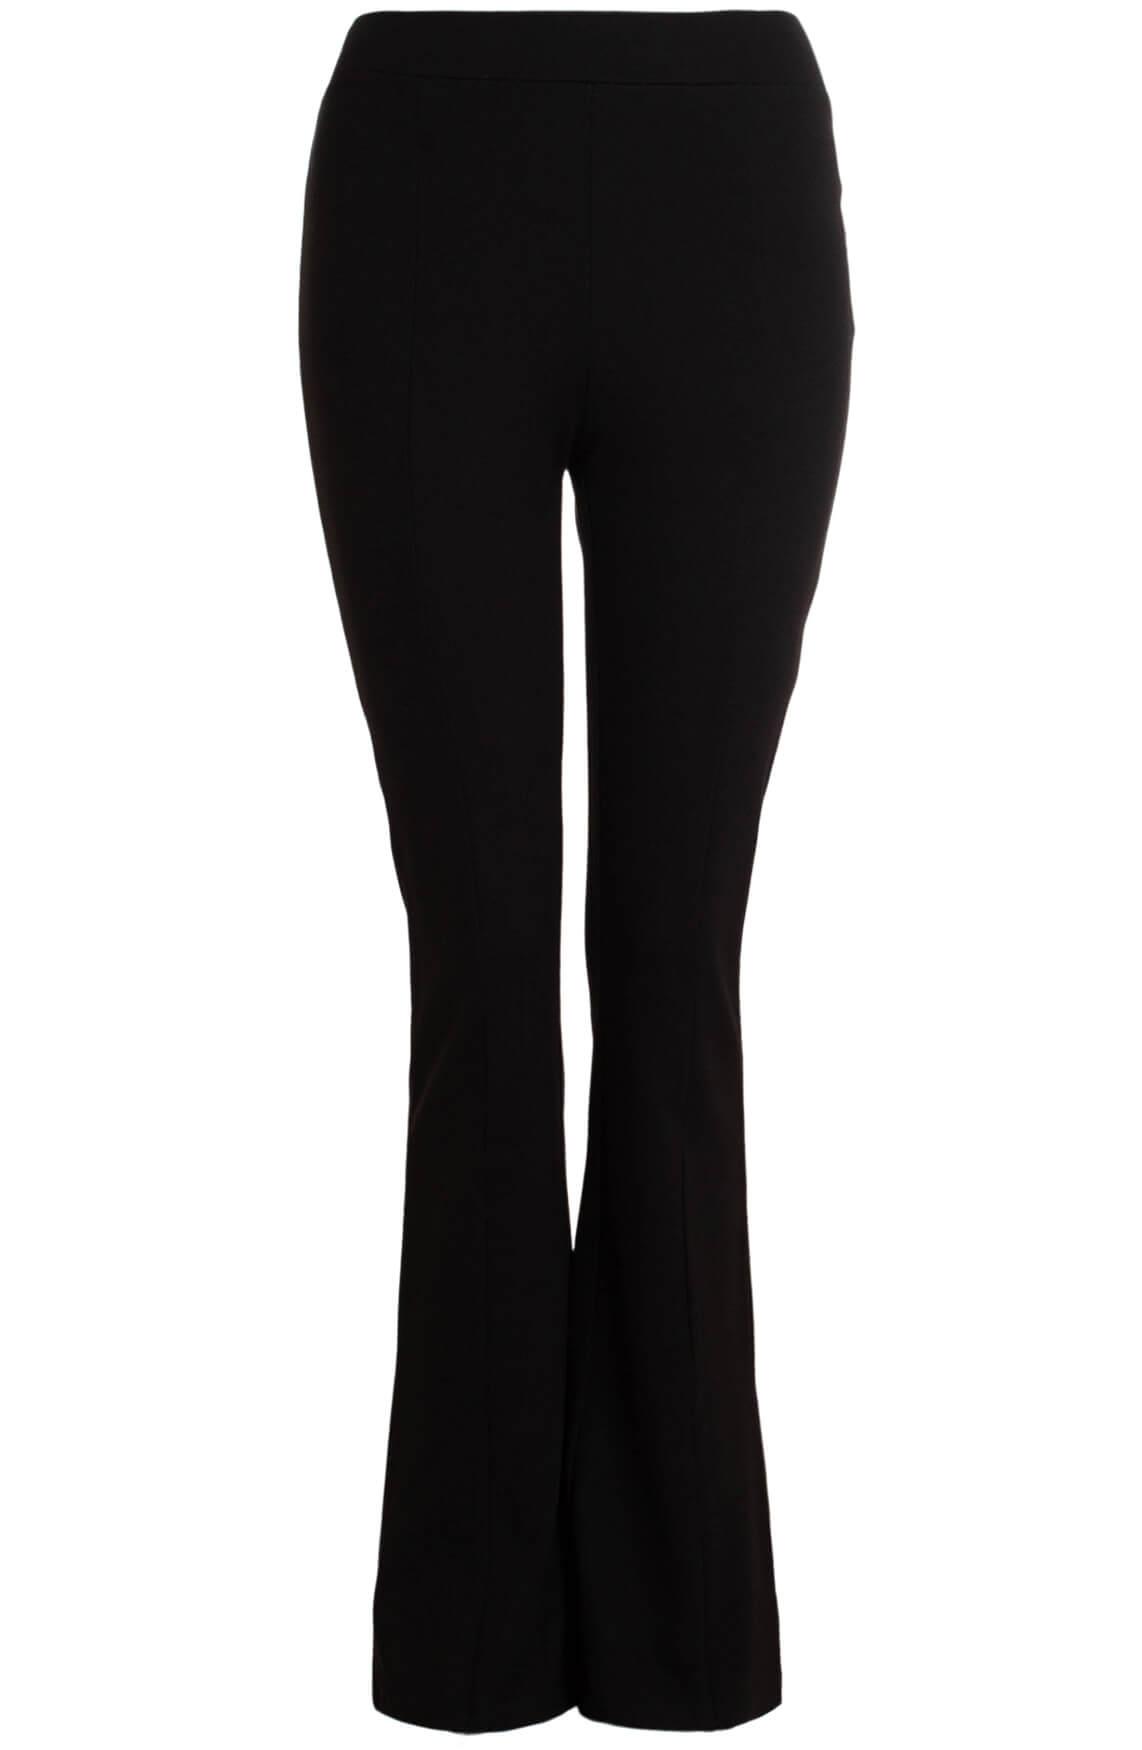 Alix The Label Dames Flared jersey broek zwart